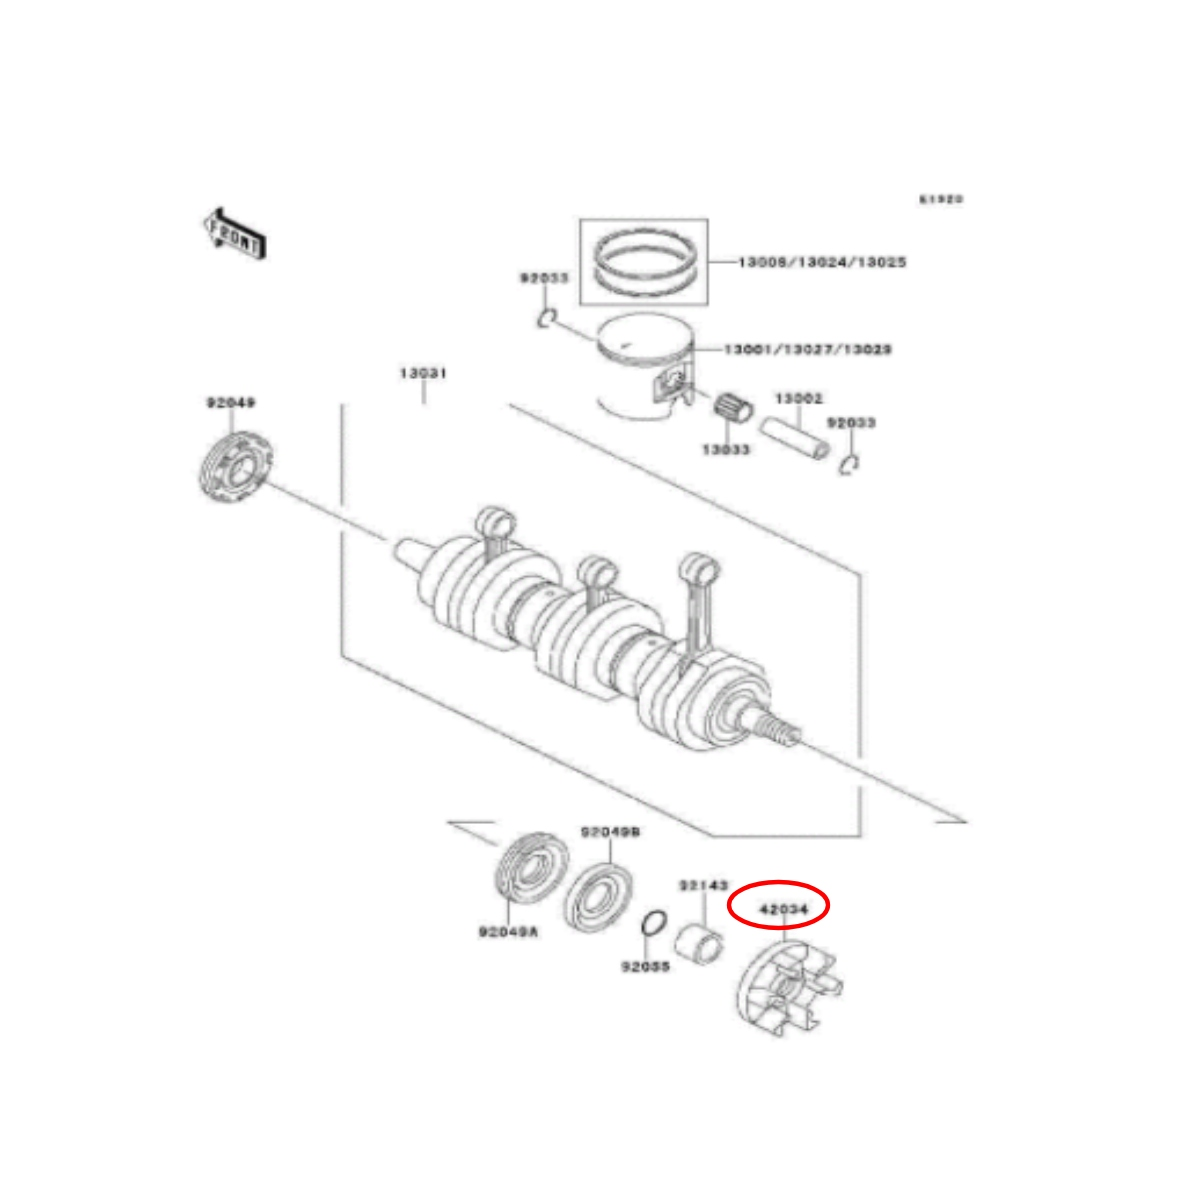 Acoplador para Jet Ski Kawasaki 900 24mm  - Radical Peças - Peças para Jet Ski